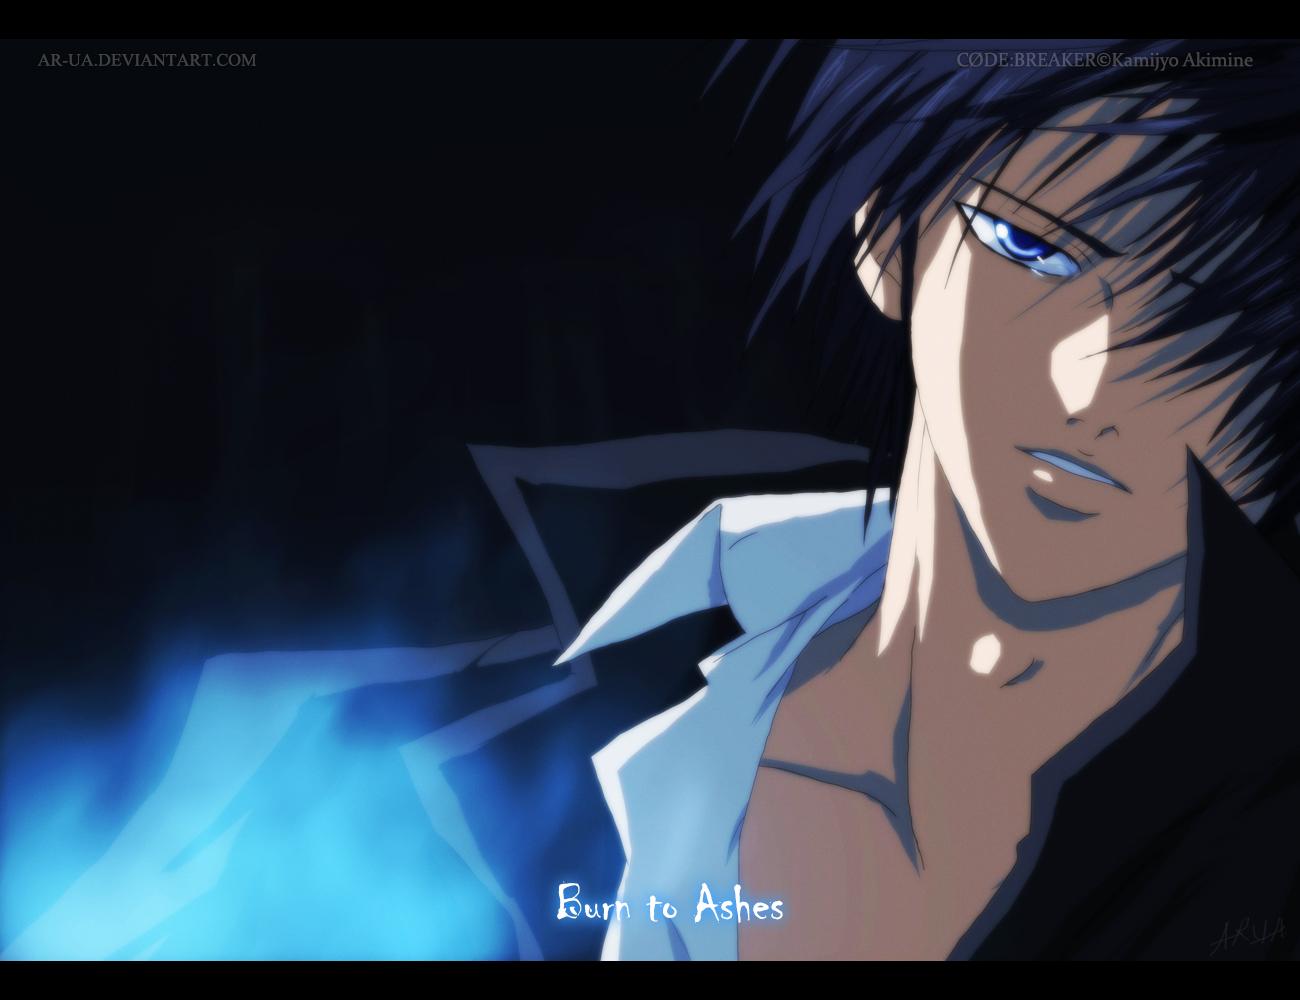 Code Breaker Ogami Rei by AR UA 1300x1000